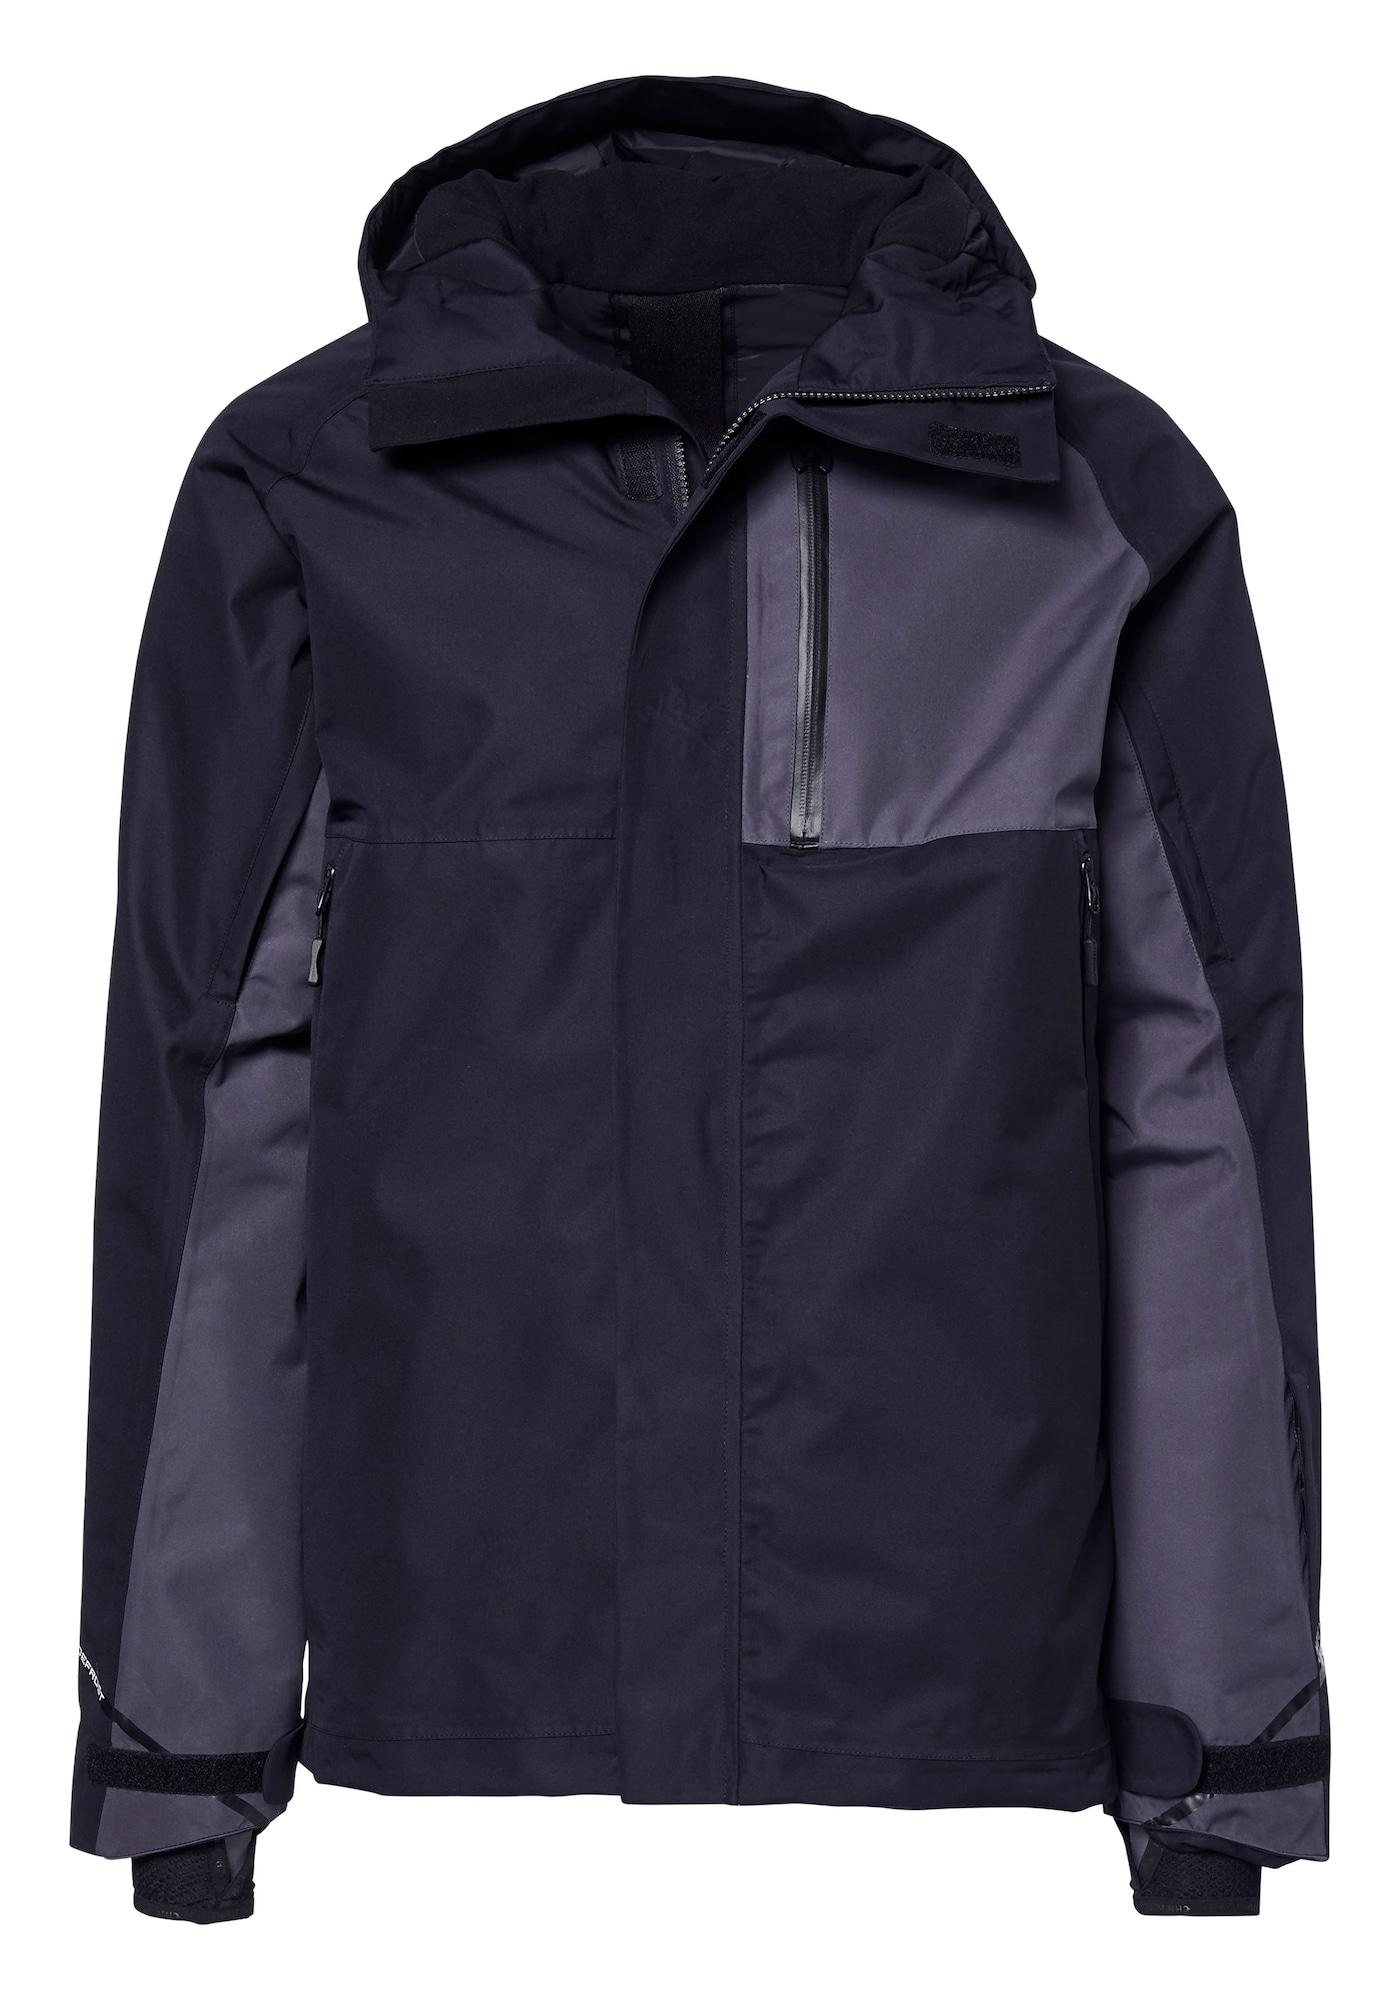 CHIEMSEE Outdoorová bunda 'ROCKY MOUNTAINS Ski Jacket'  šedá / černá